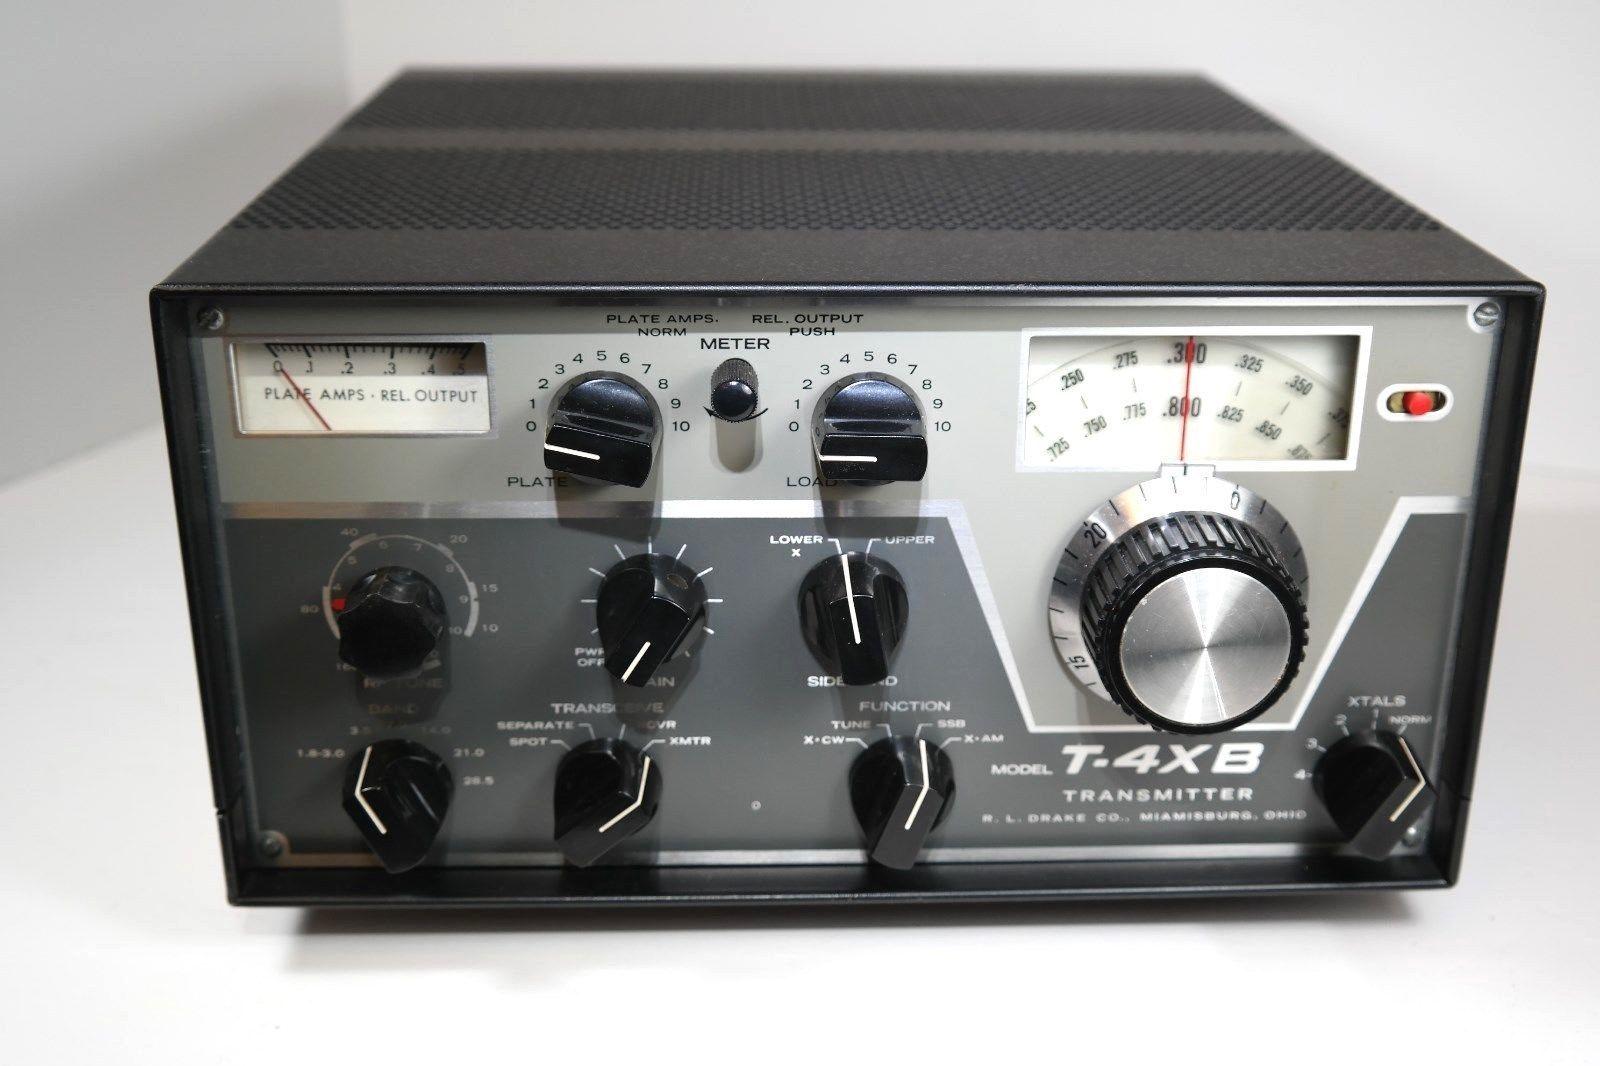 Collector Quality Gorgeous Drake T 4xb Hf Transmitter Refurbed By Drake Ebay Ham Radio Ham Radio Equipment Radio